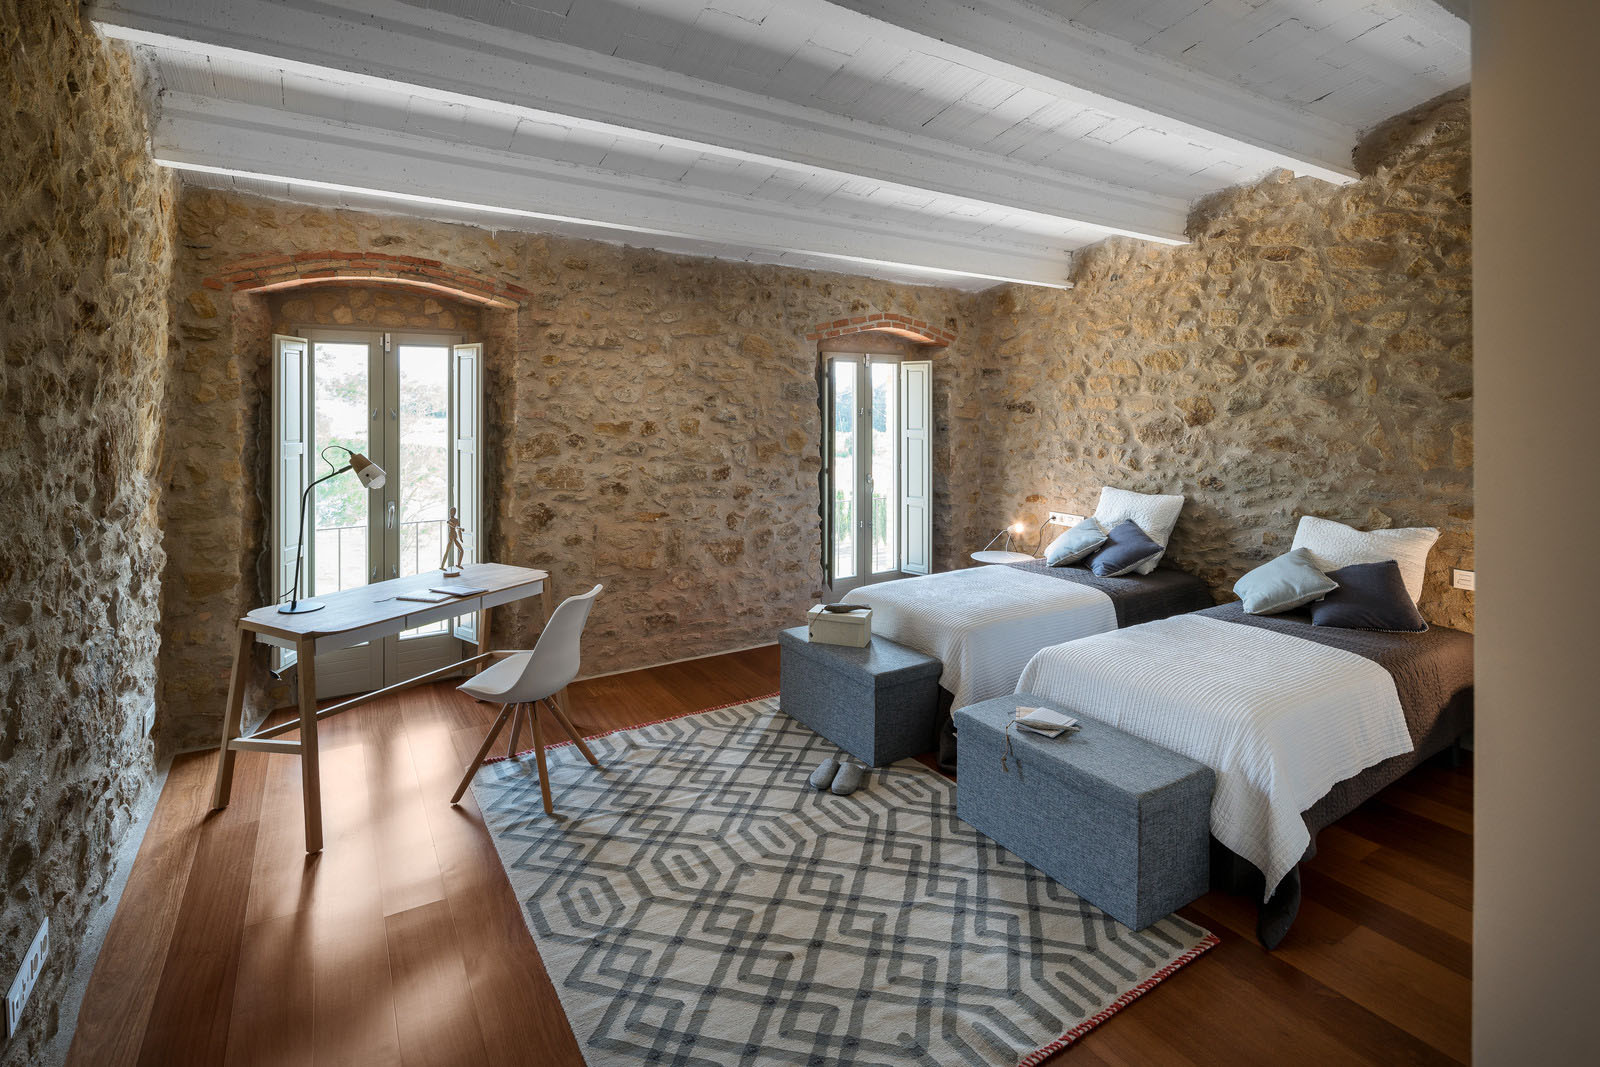 mediterranean-country-stone-house-gloria-duran_12 | idesignarch